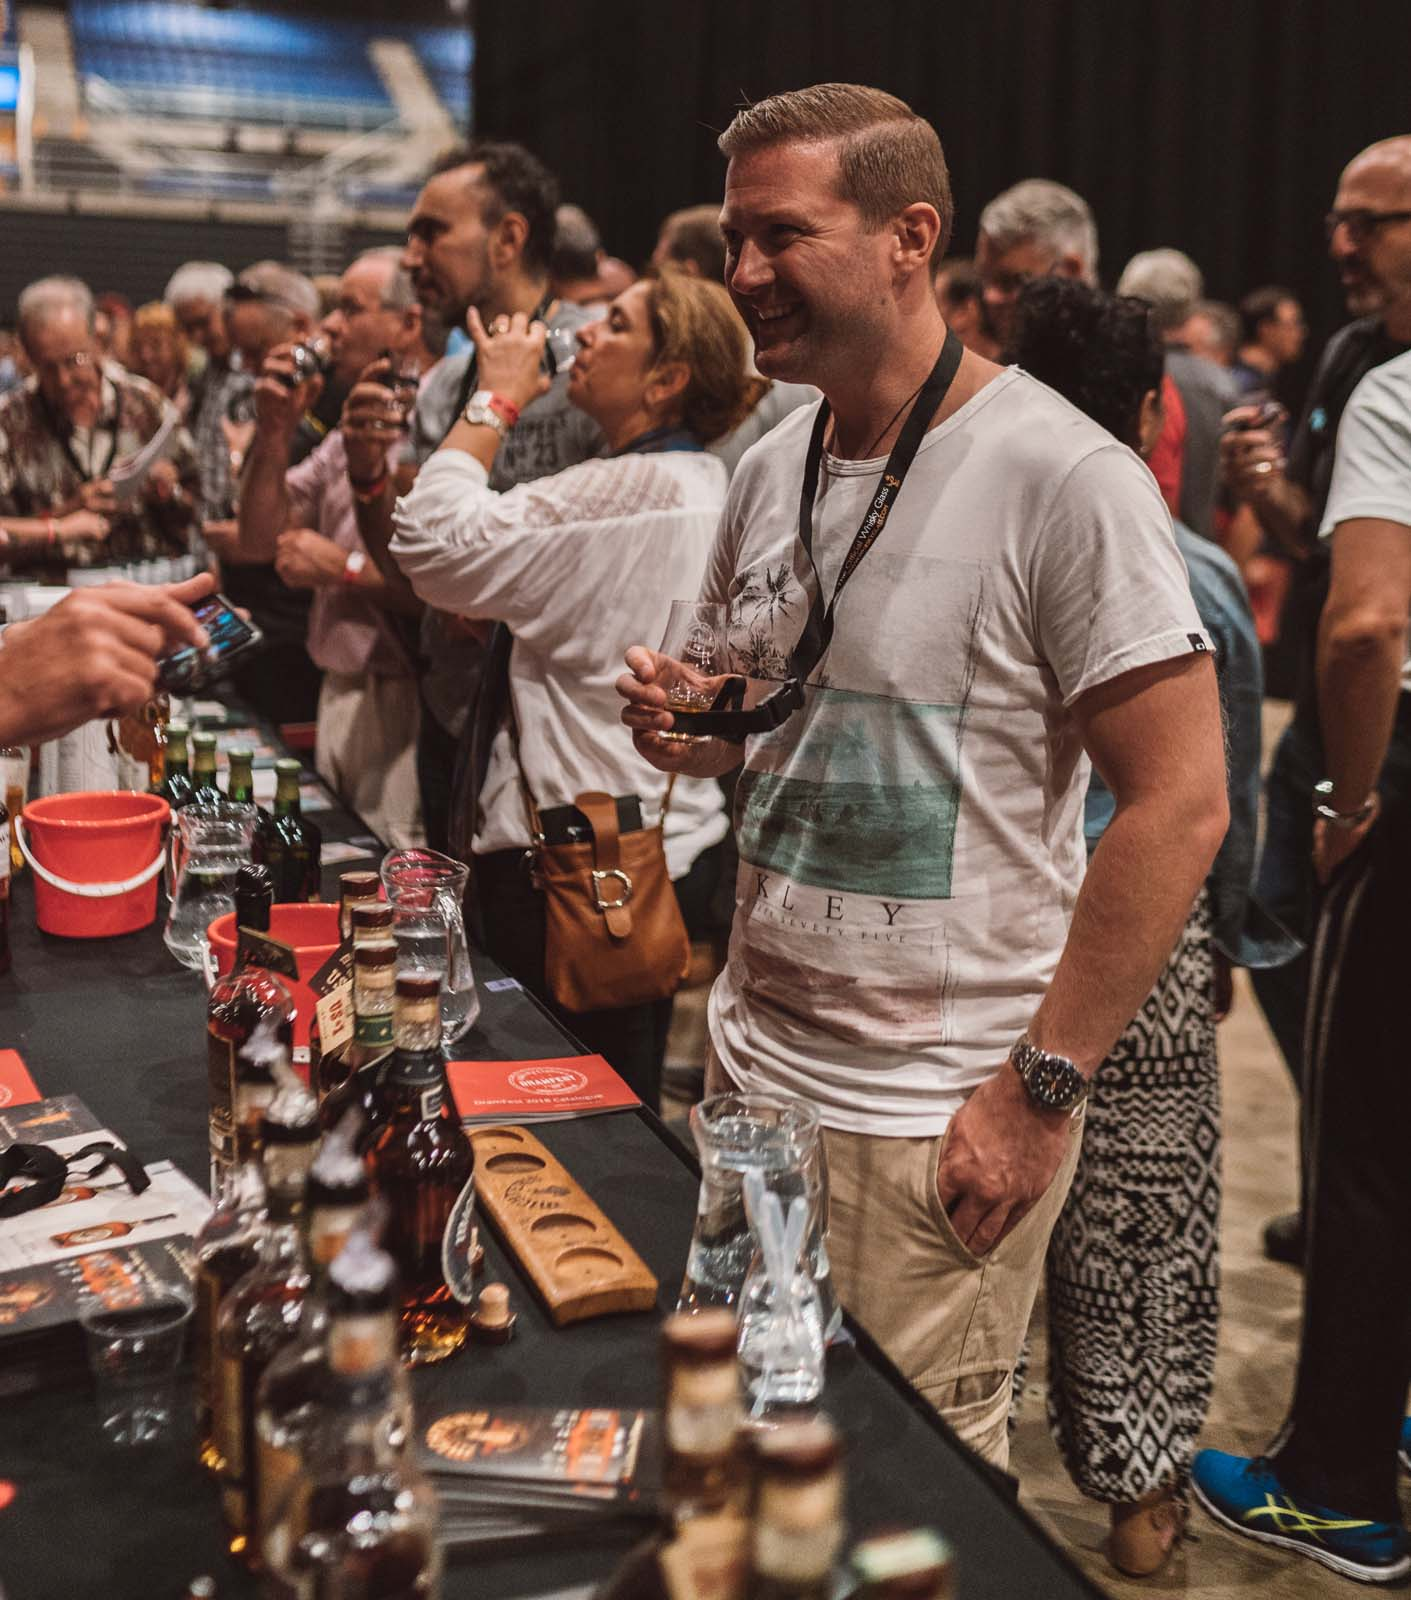 Dramfest 2018 for Whisky Galore-388.jpg